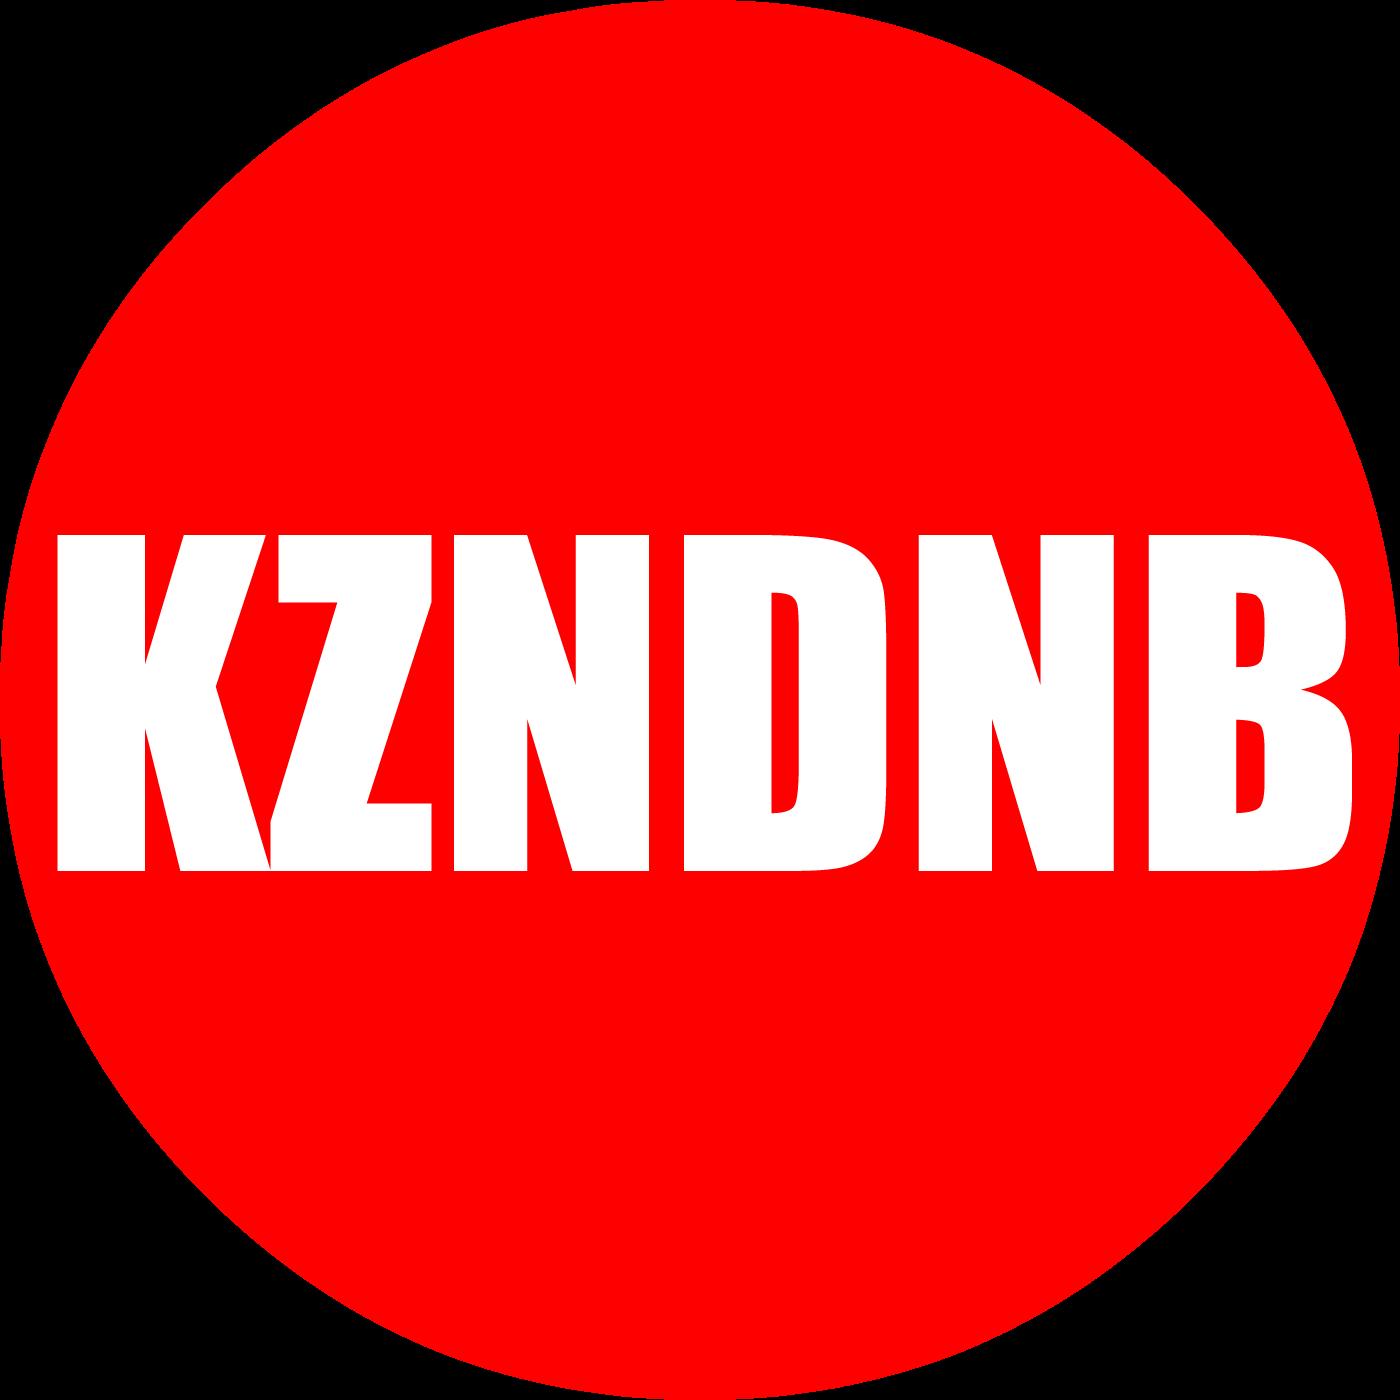 Обложка KZNDNB